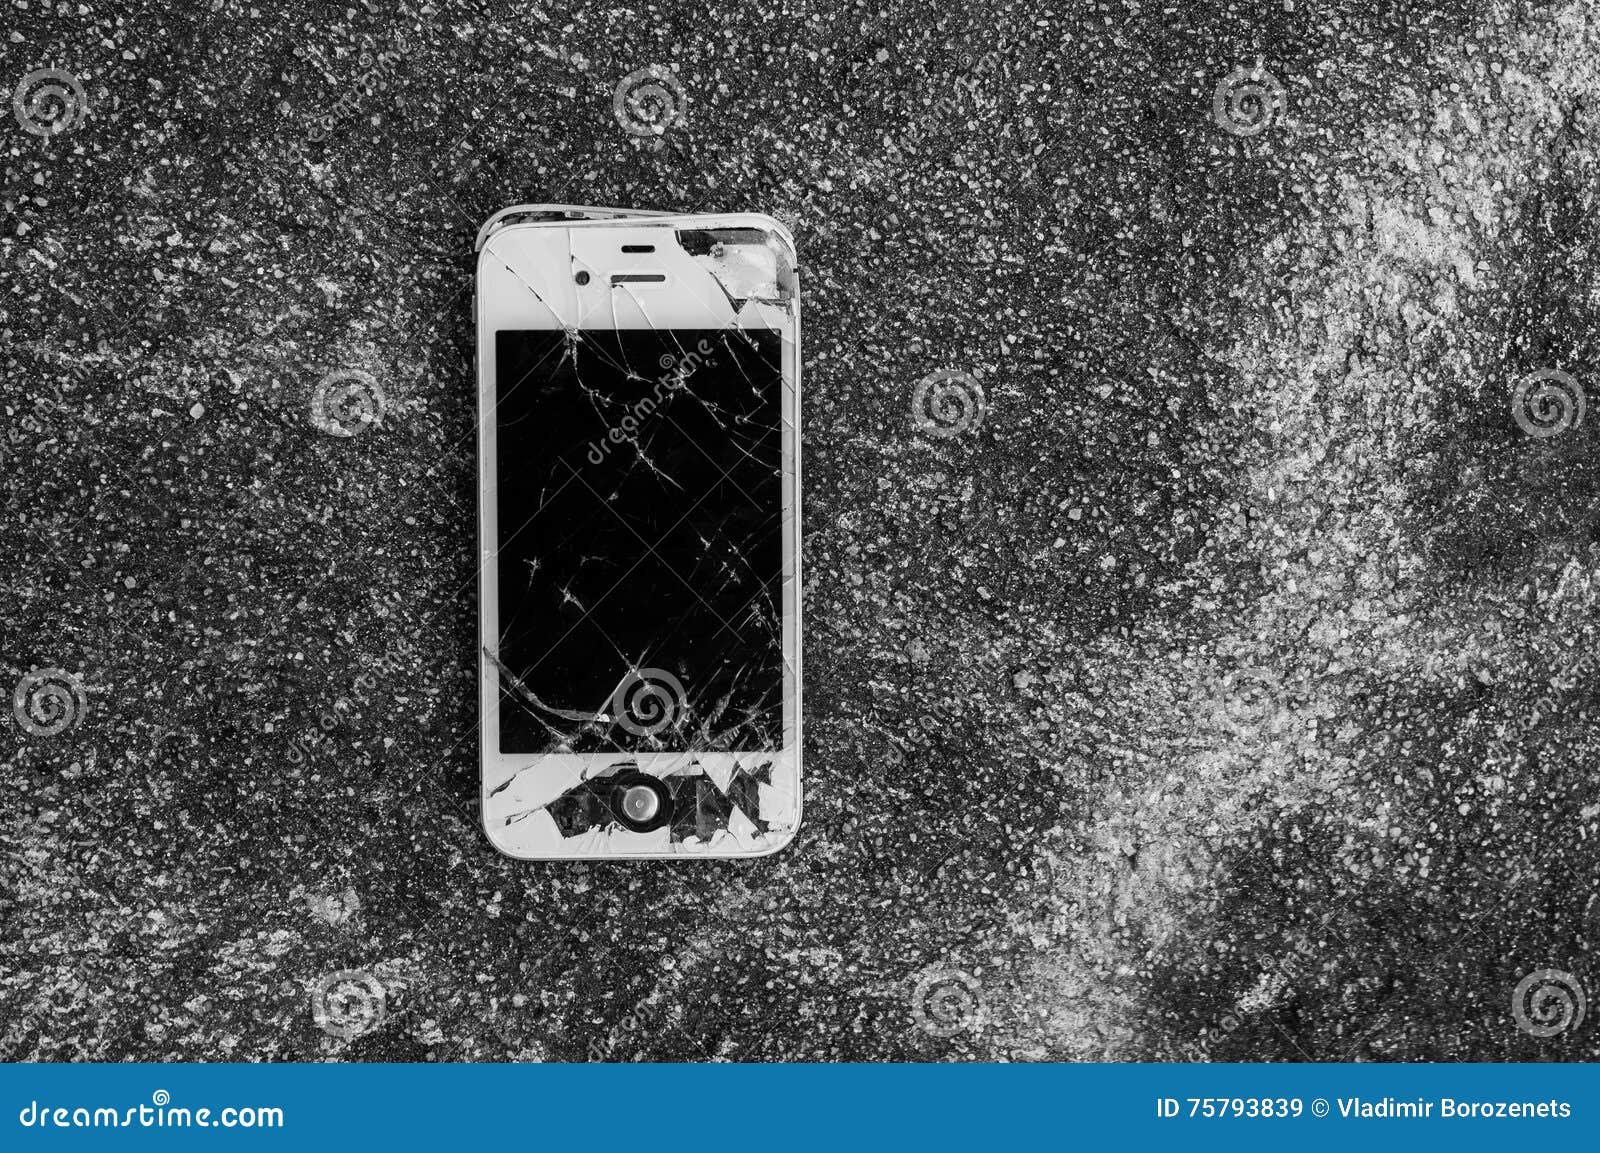 Broken iPhone 4S on asphalt road